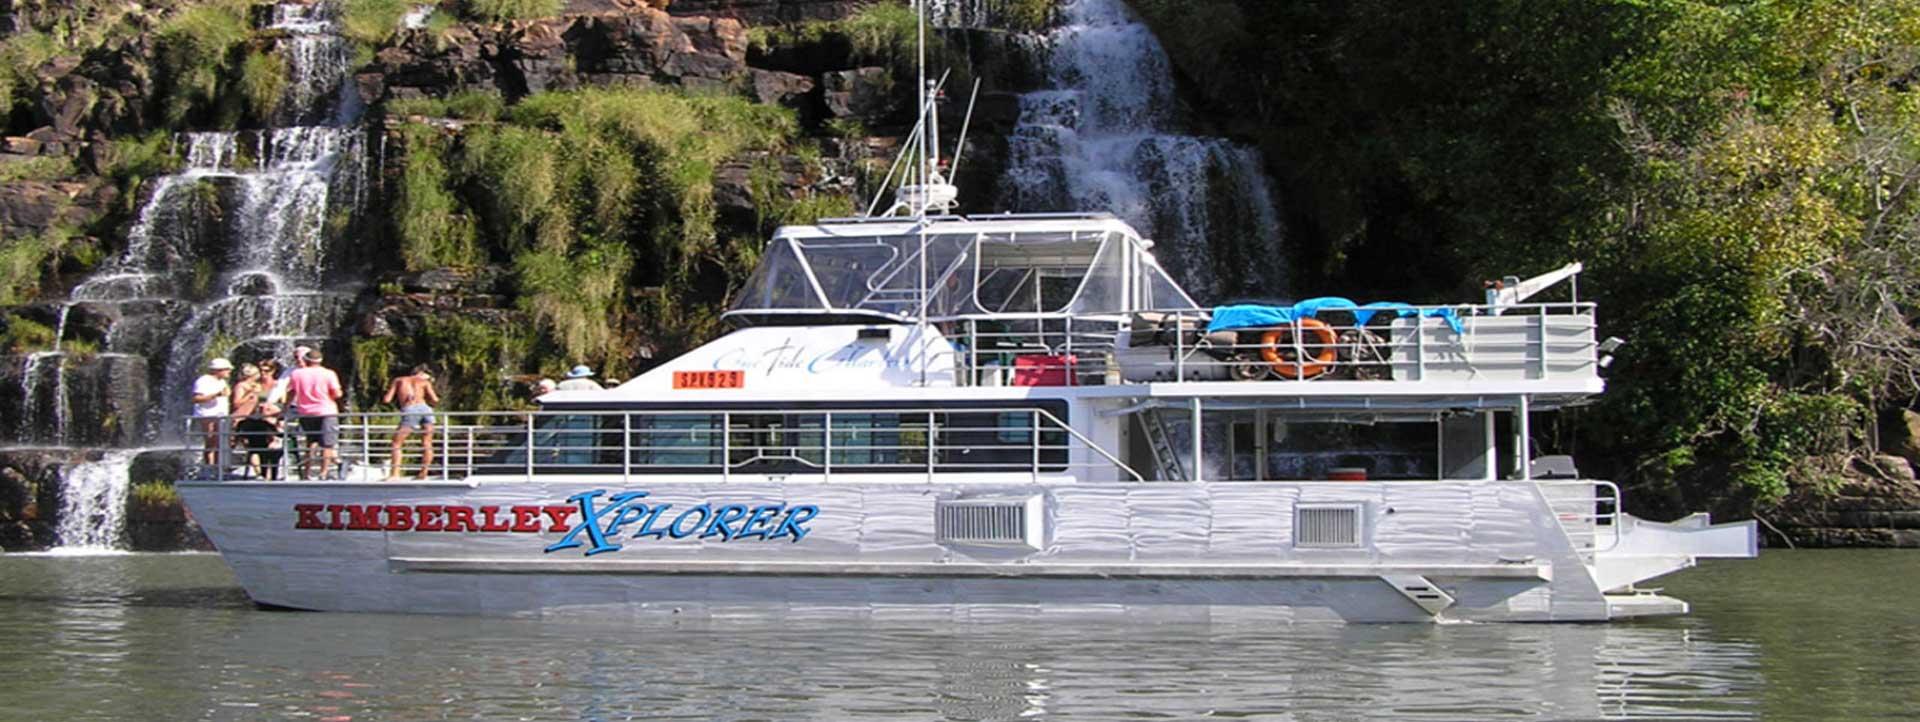 KIMBERLEY-XPLORER-Kimberley-cruises-at-Kings-Cascades